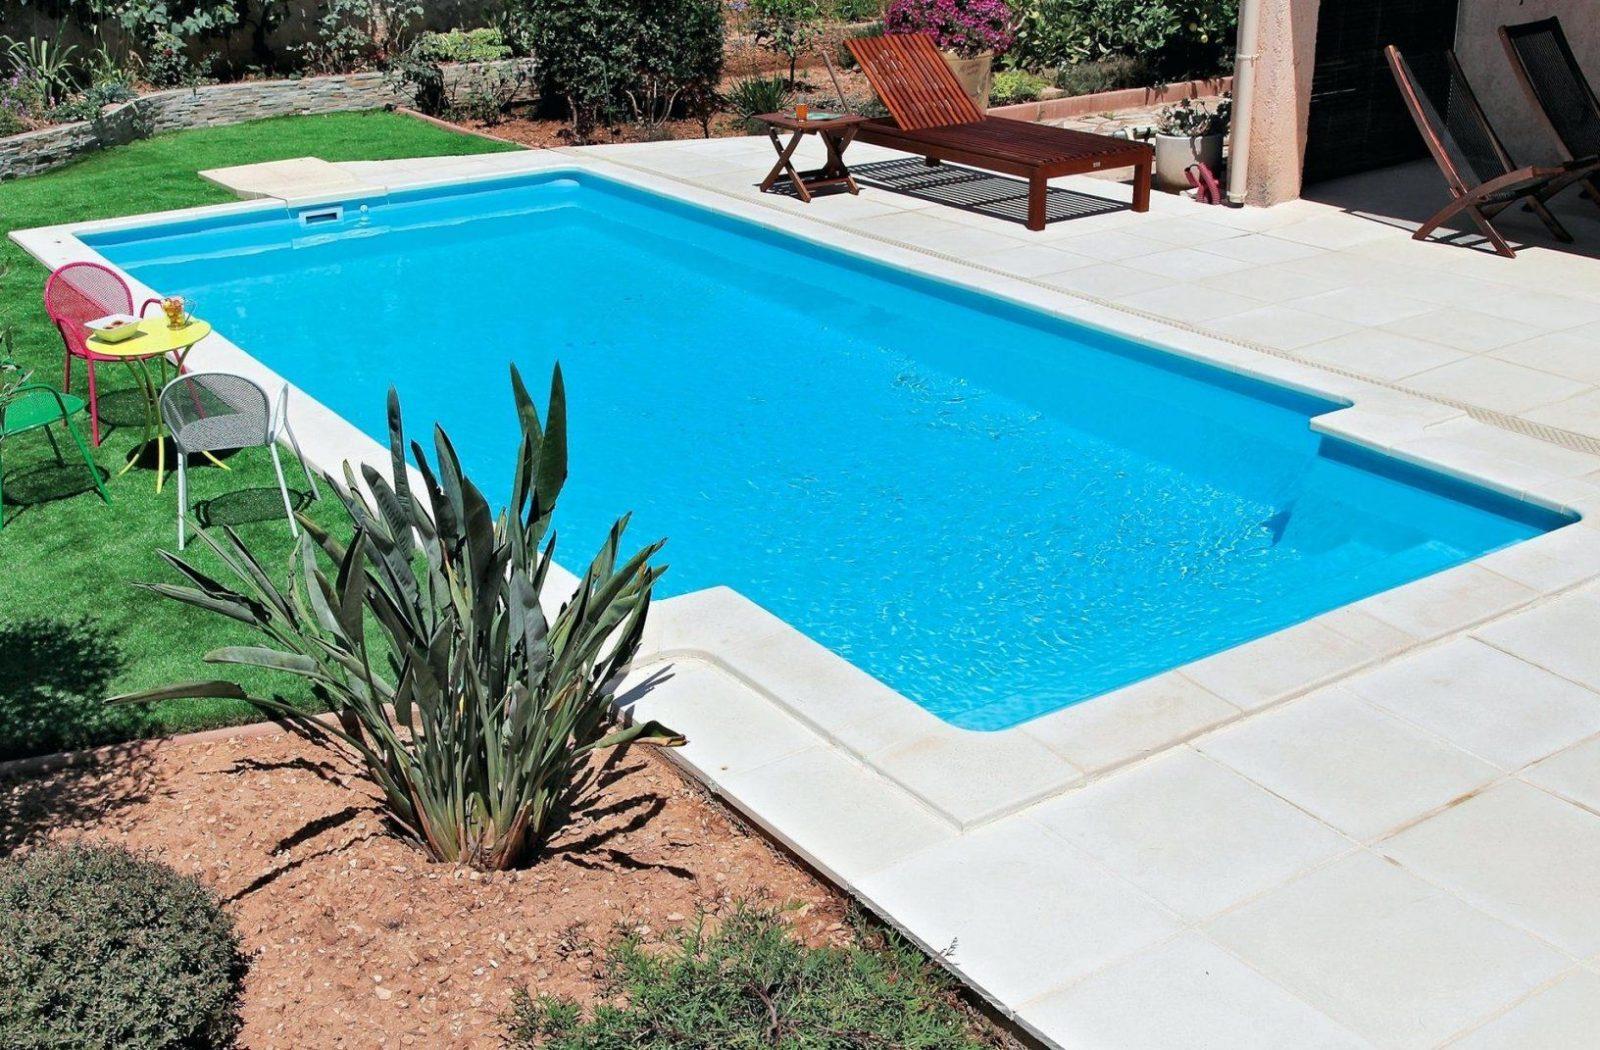 Swimmingpool Im Garten Pool M X M Integrieren Swimming Selber Bauen von Pool Im Garten Integrieren Photo